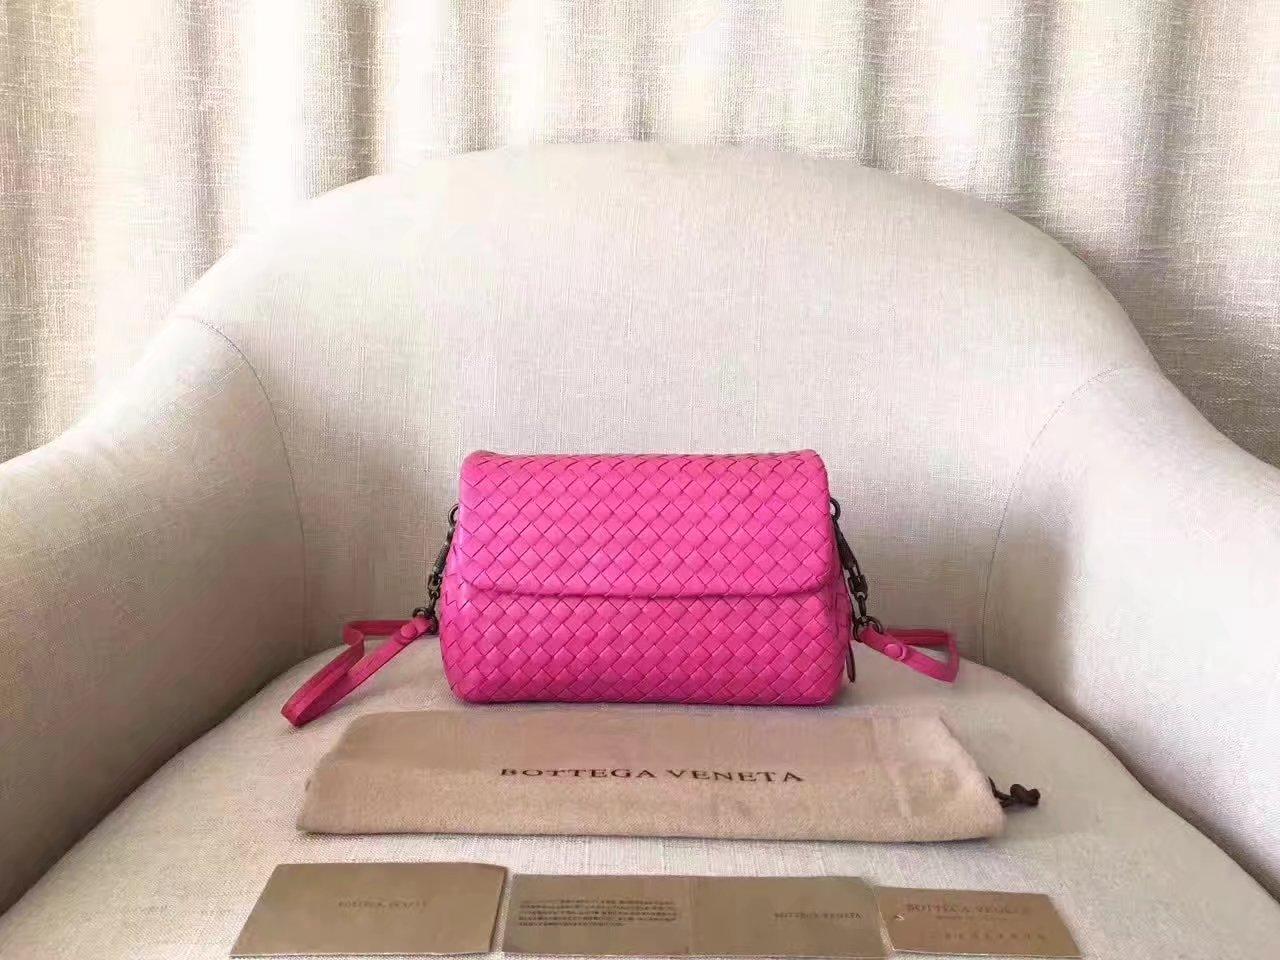 Bottega Veneta Baby Olimpia Bag in Glicine Intrecciato Nappa Leather Pink